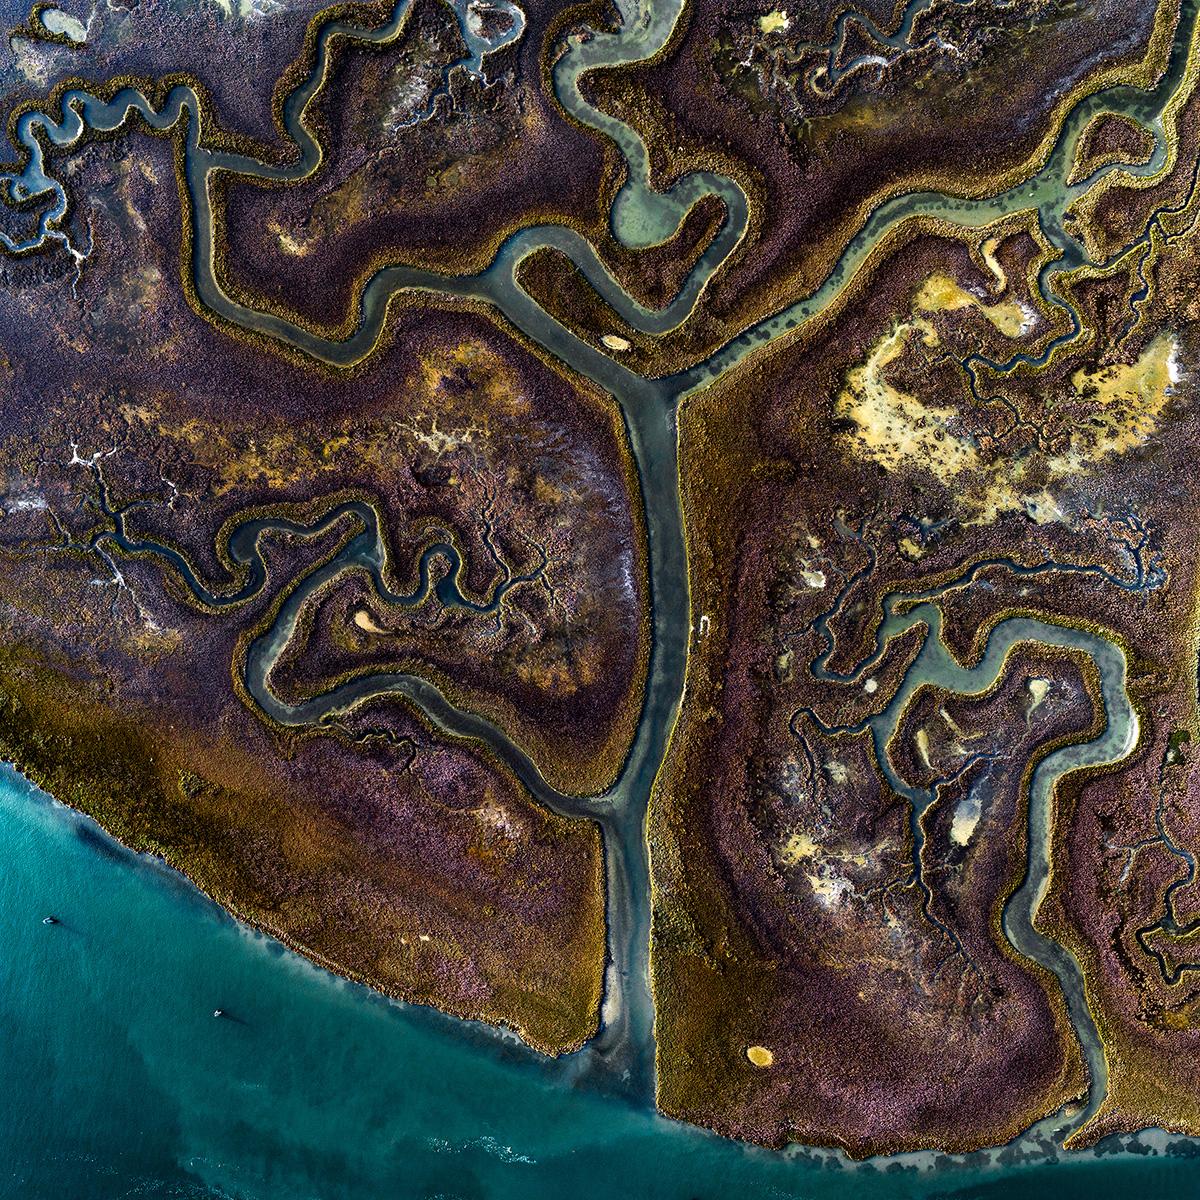 08-water-shape-earth-watershape.earth-milan-radisics-photography-fine-art-print-milan.hu_